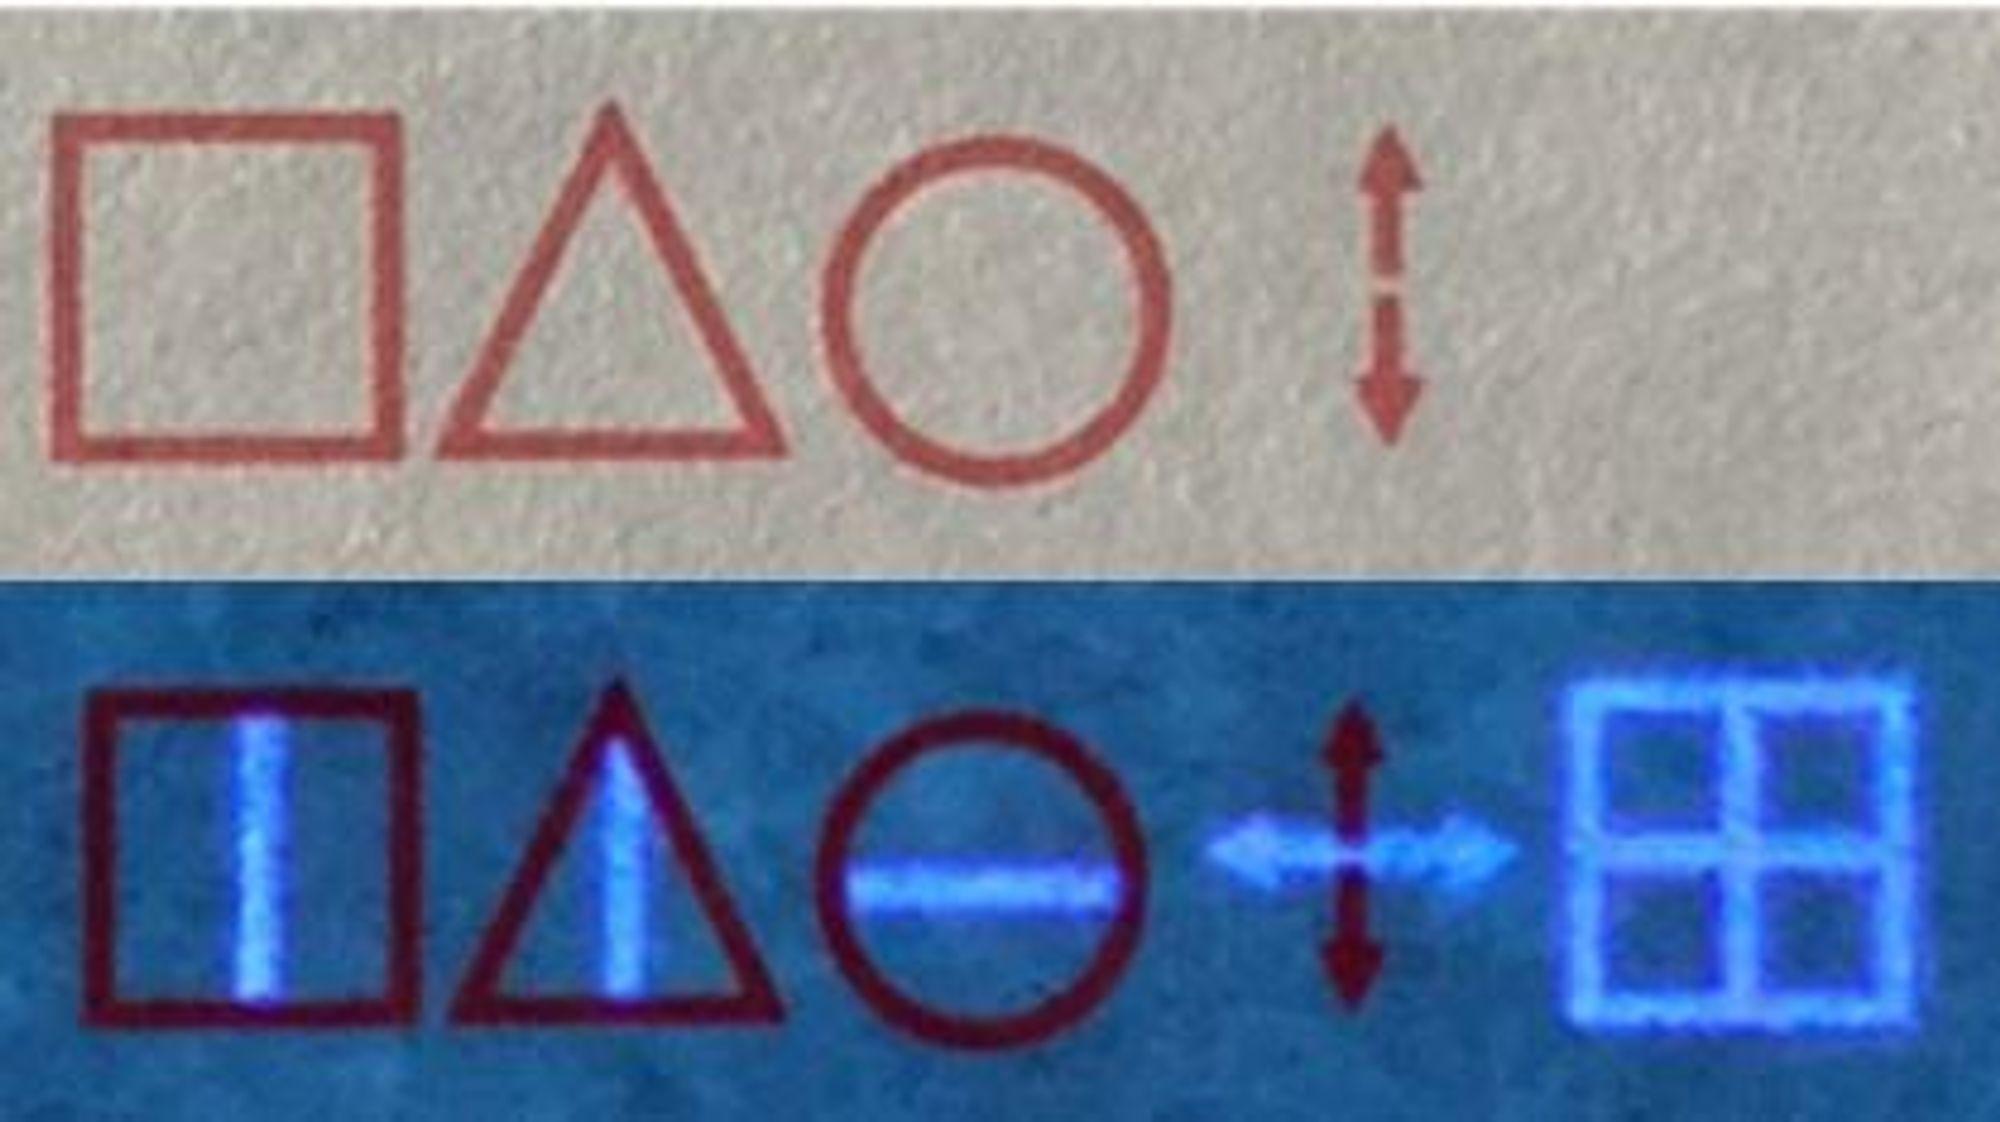 Øverste linje skrevet i rødt dekodes til 'STOP'. Nederste linje, som er tilføyd usynlig blekk, dekodes til 'BEGIN'.